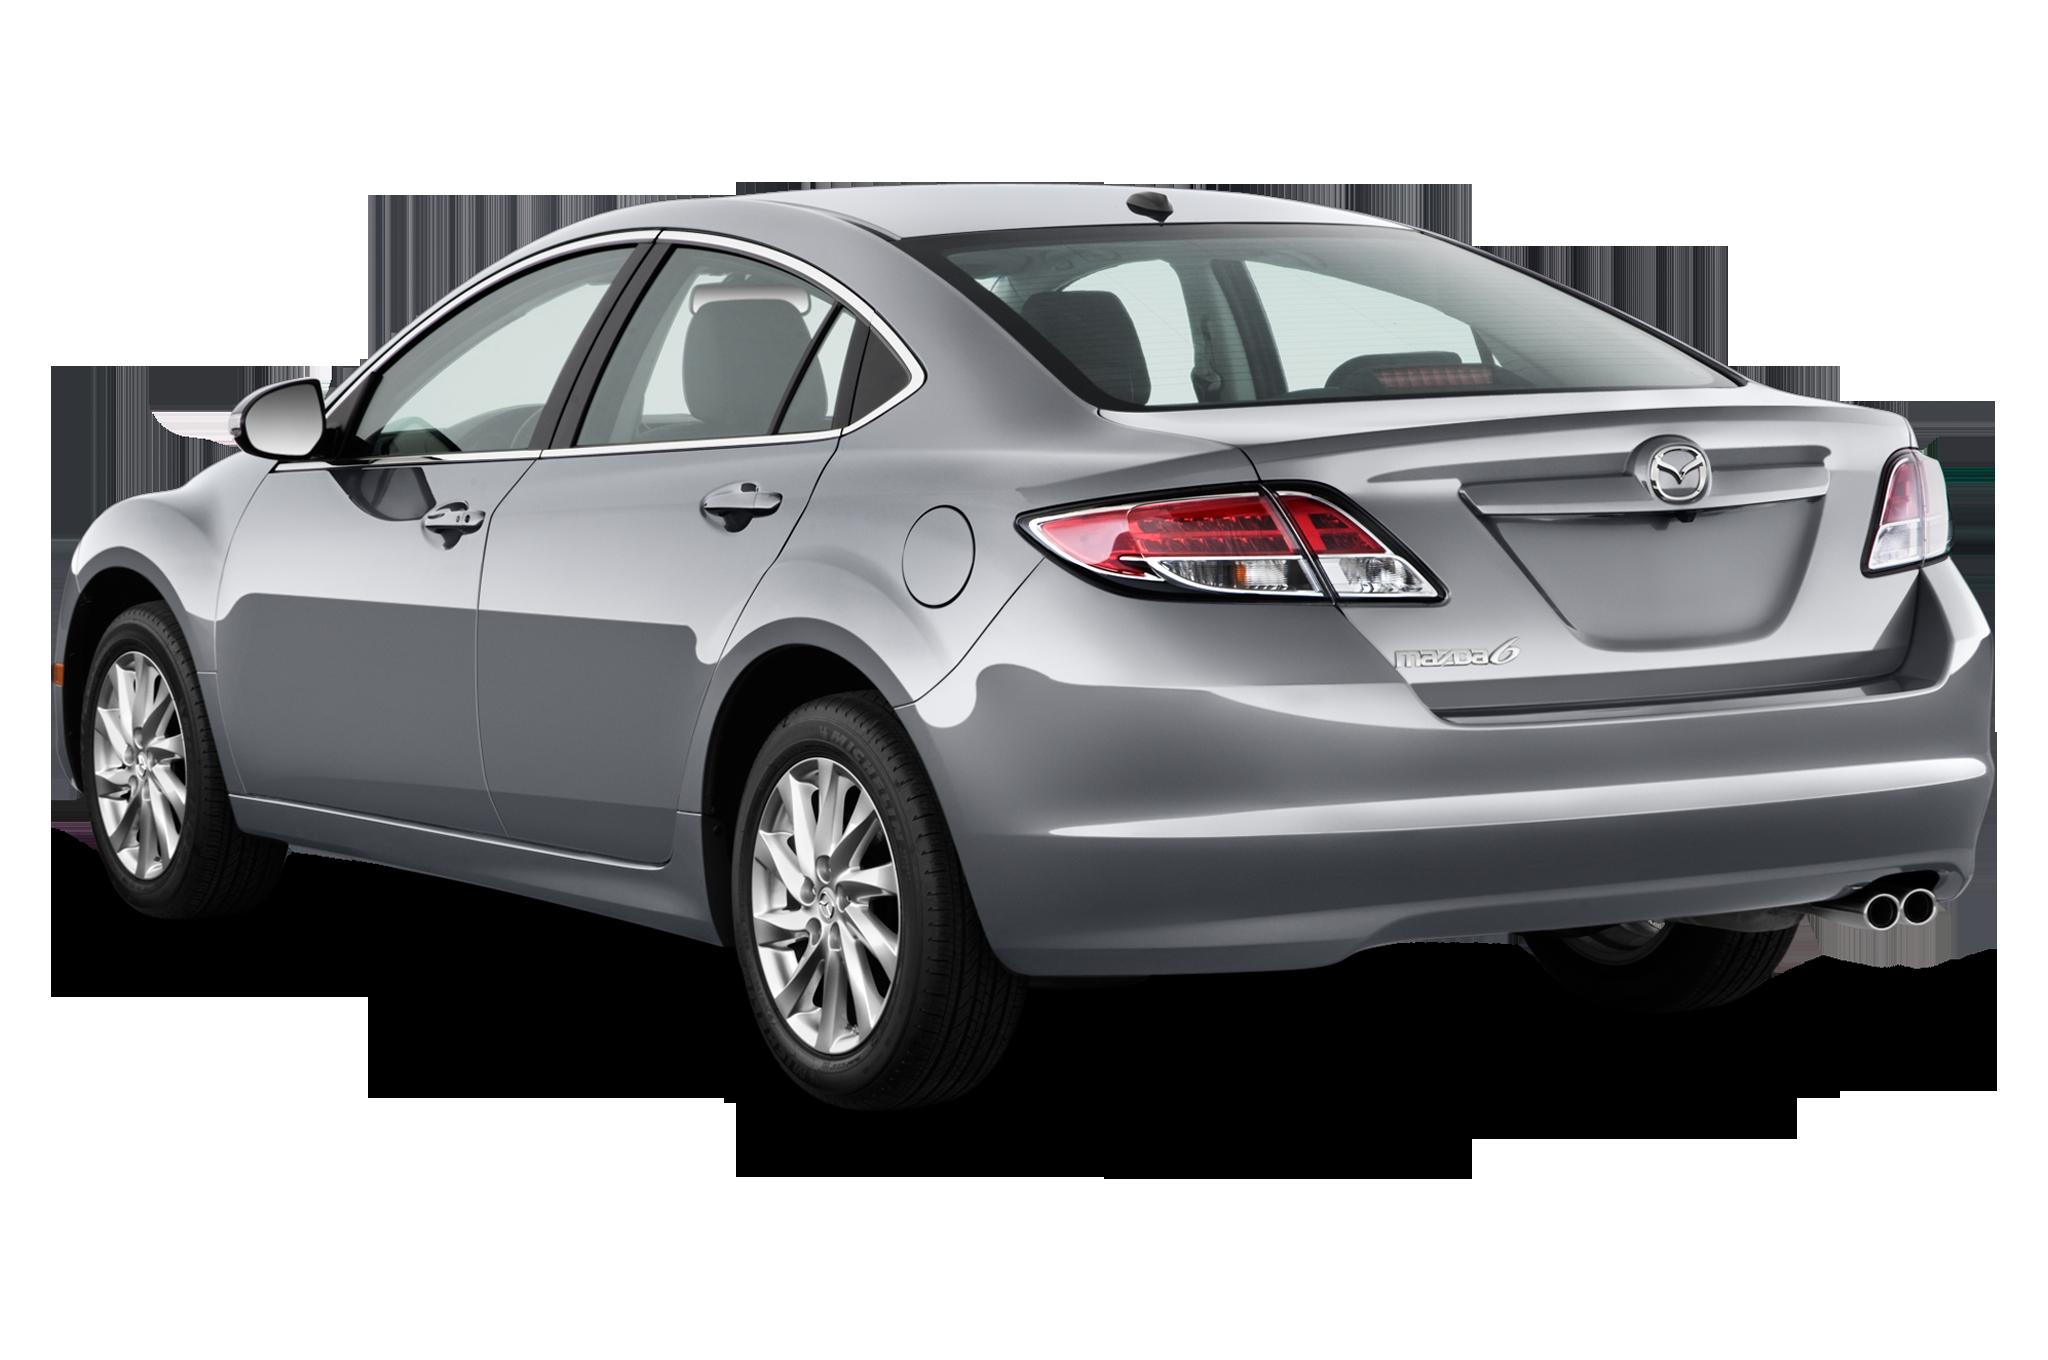 New York 2012: Mazda Details the 2014 Mazda 6, On Sale Next Year